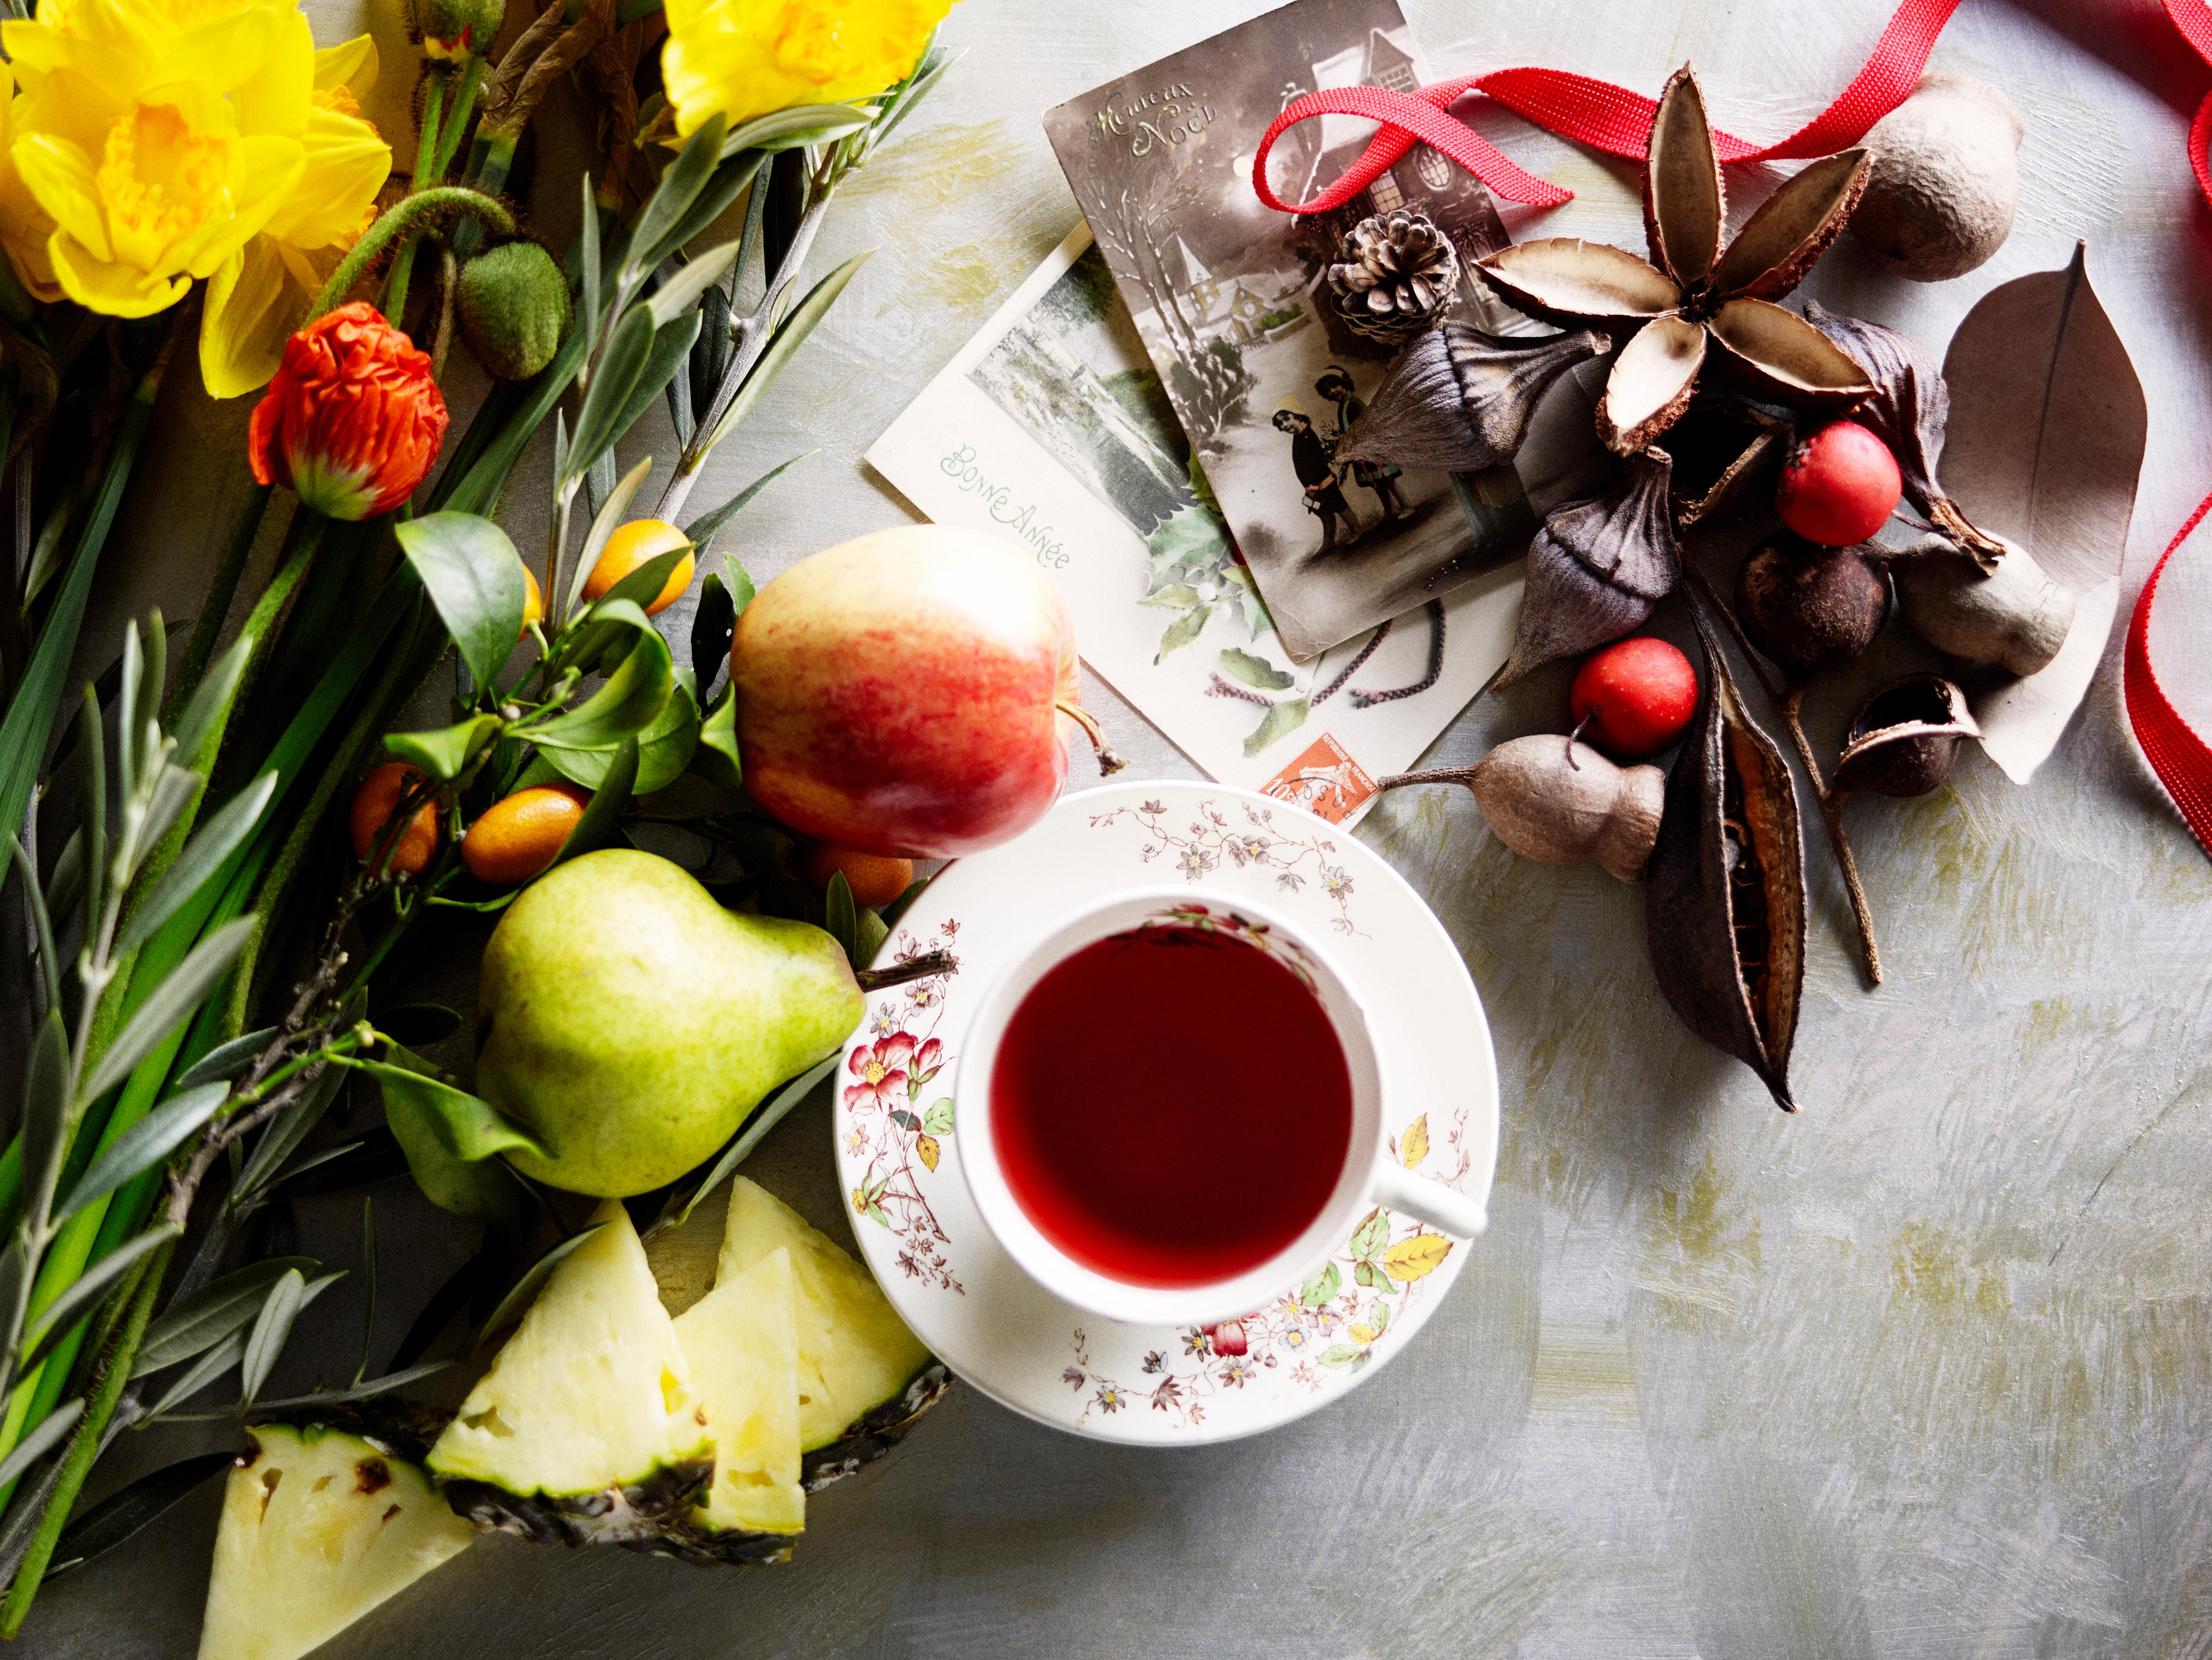 NEW No 84 Pear Blossom Organic Tea Tin by Ovvio Organics 2